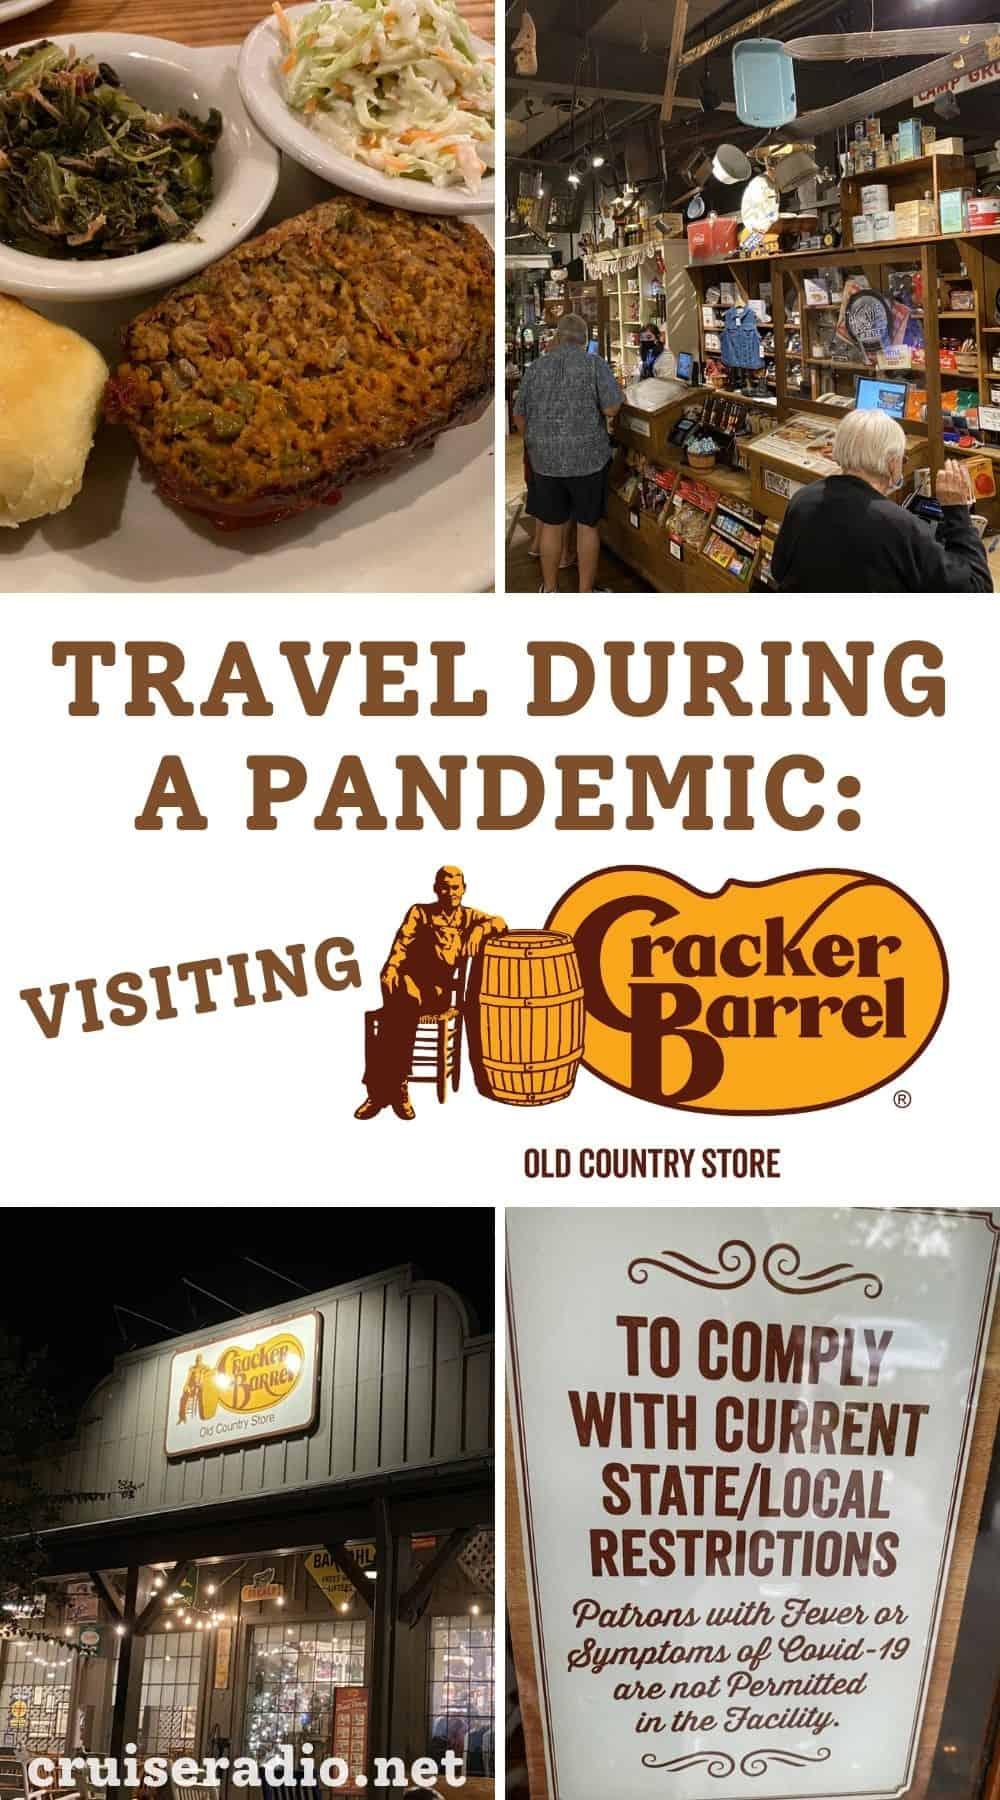 travel during a pandemic - visiting cracker barrel restaurant